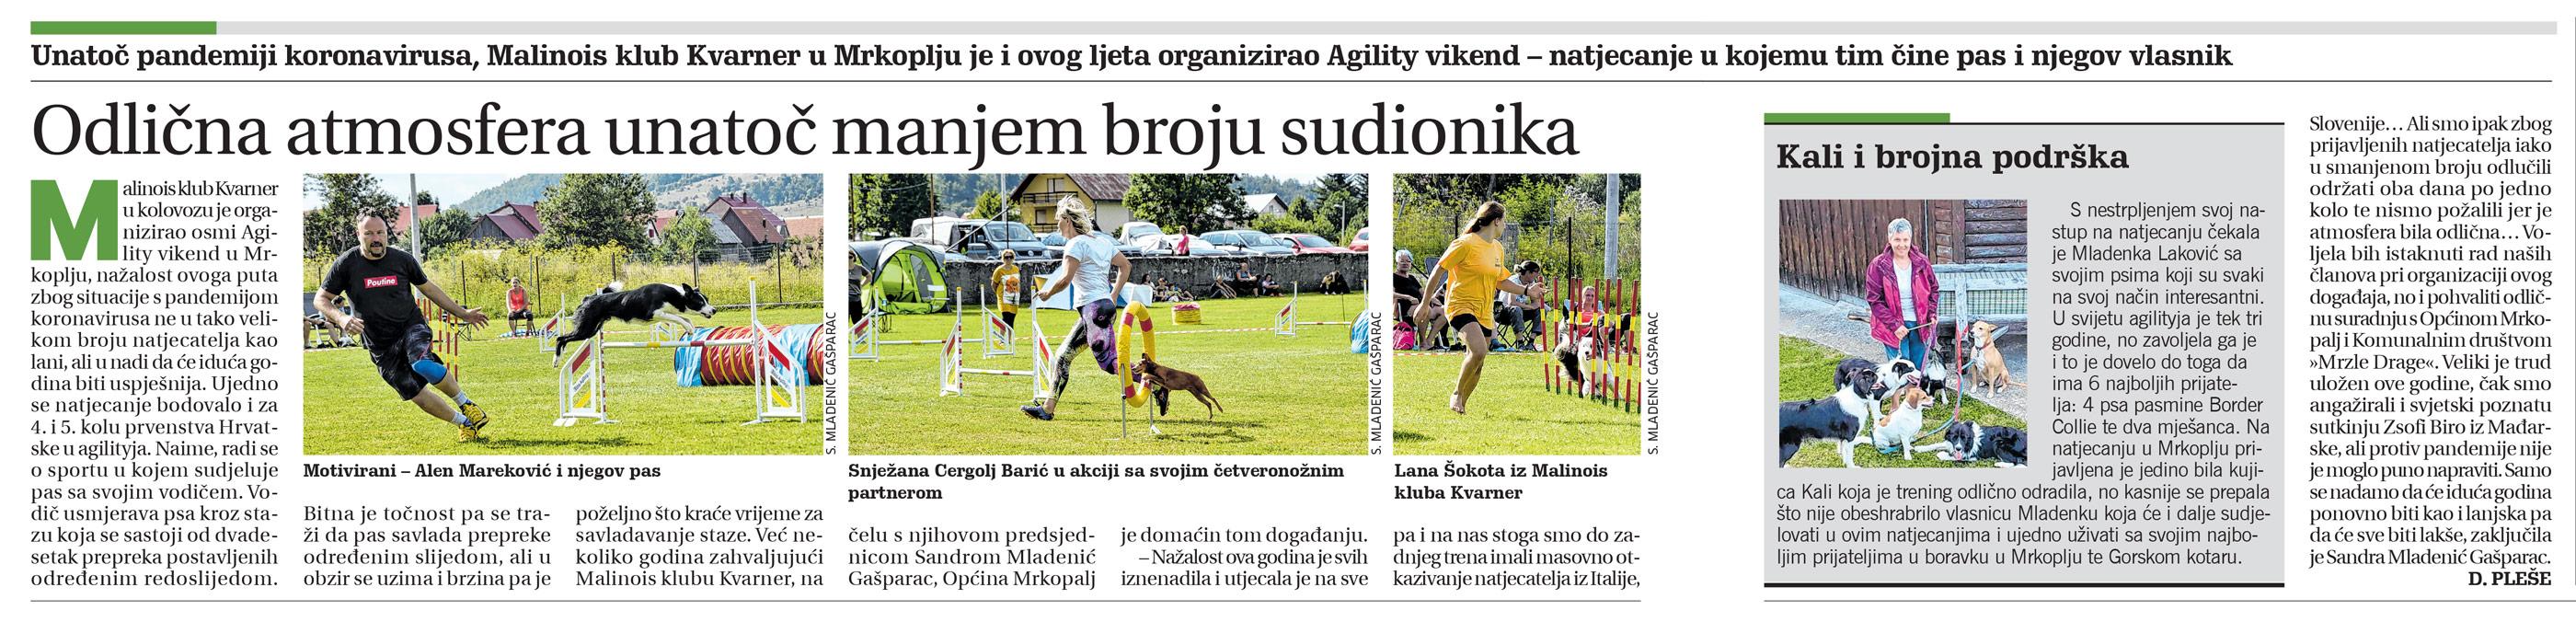 članak novi list, agility vikend